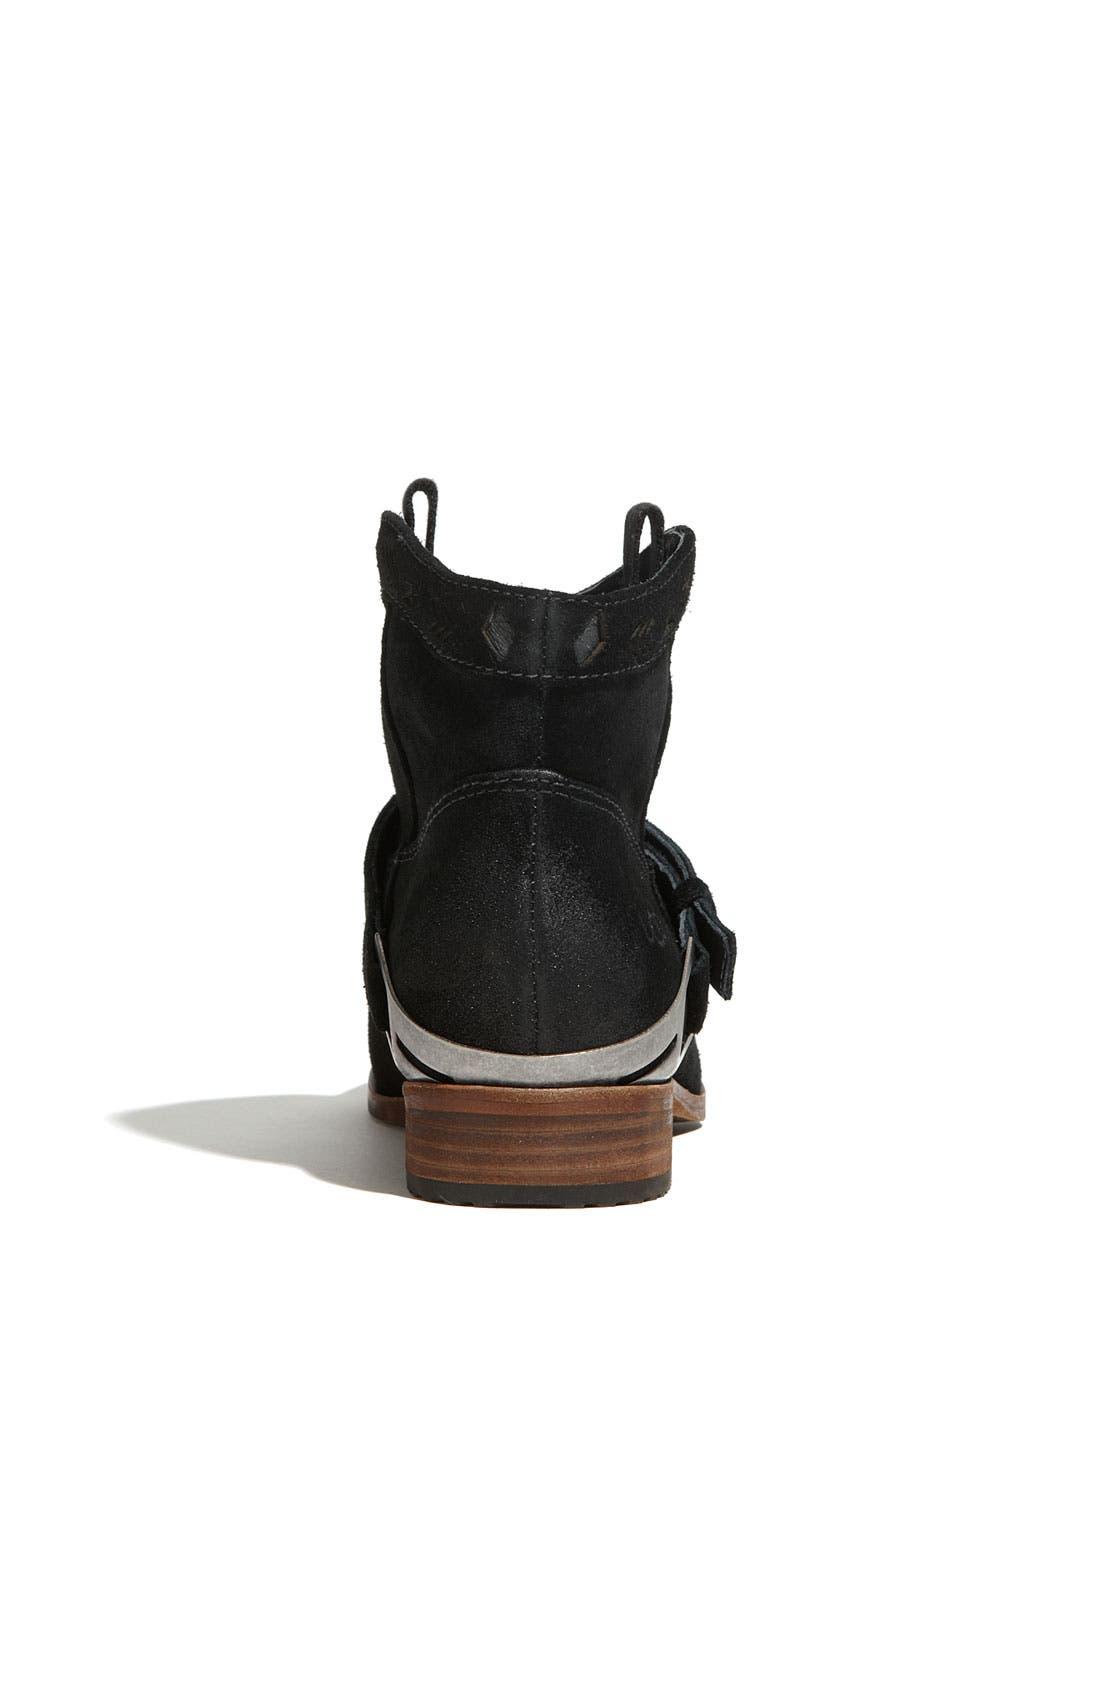 Australia 'Austin' Ankle Boot,                             Alternate thumbnail 4, color,                             001